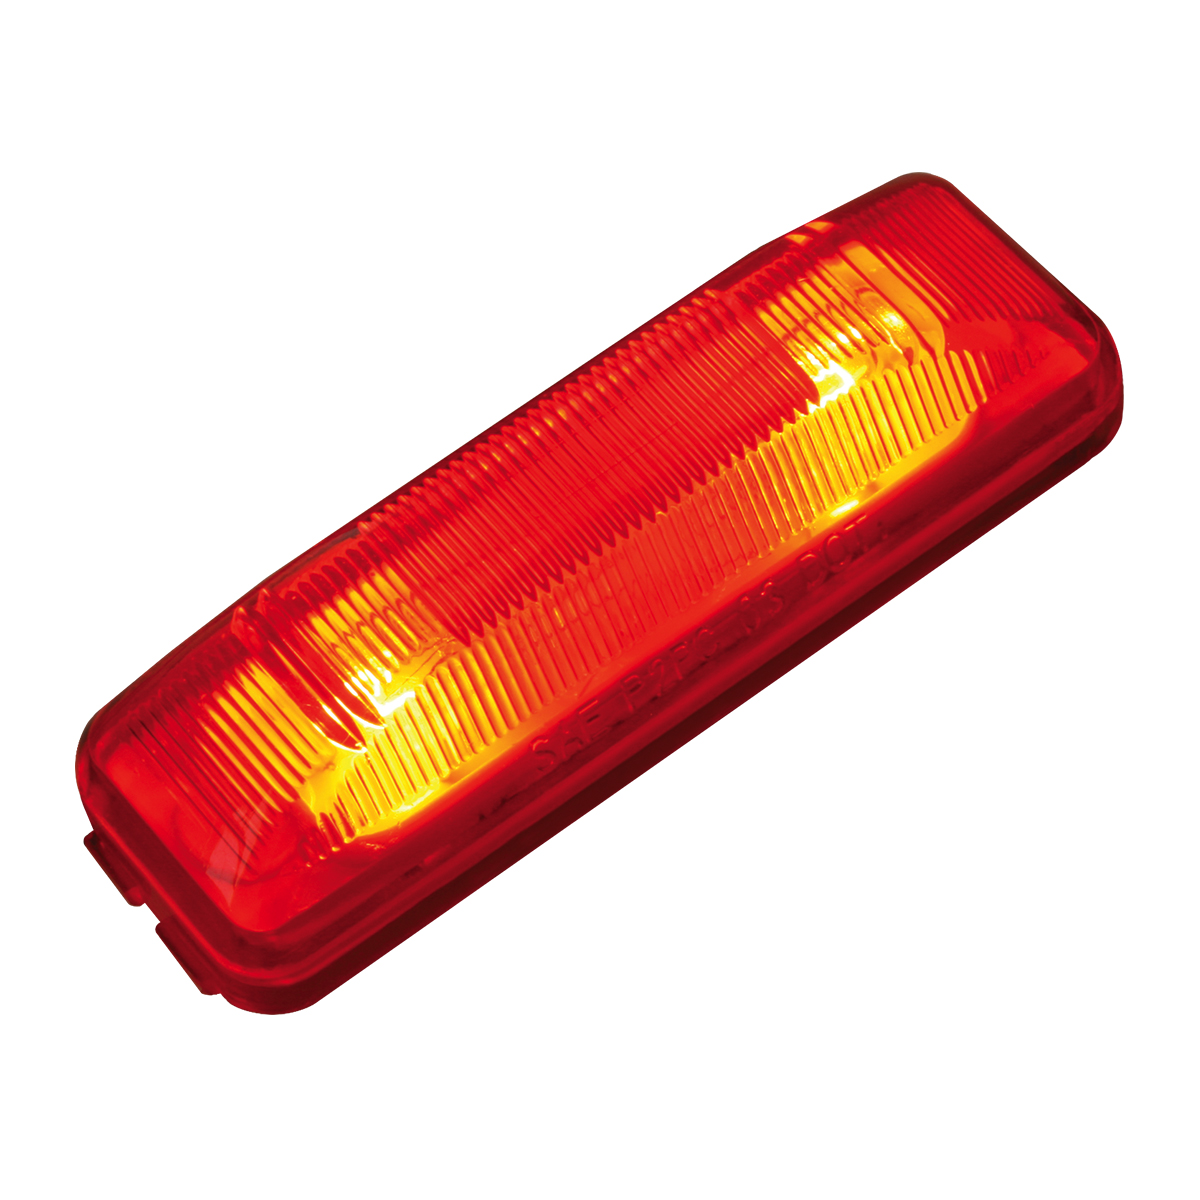 #80345 Medium Rectangular Two-Bulb Sealed Light Only - Red